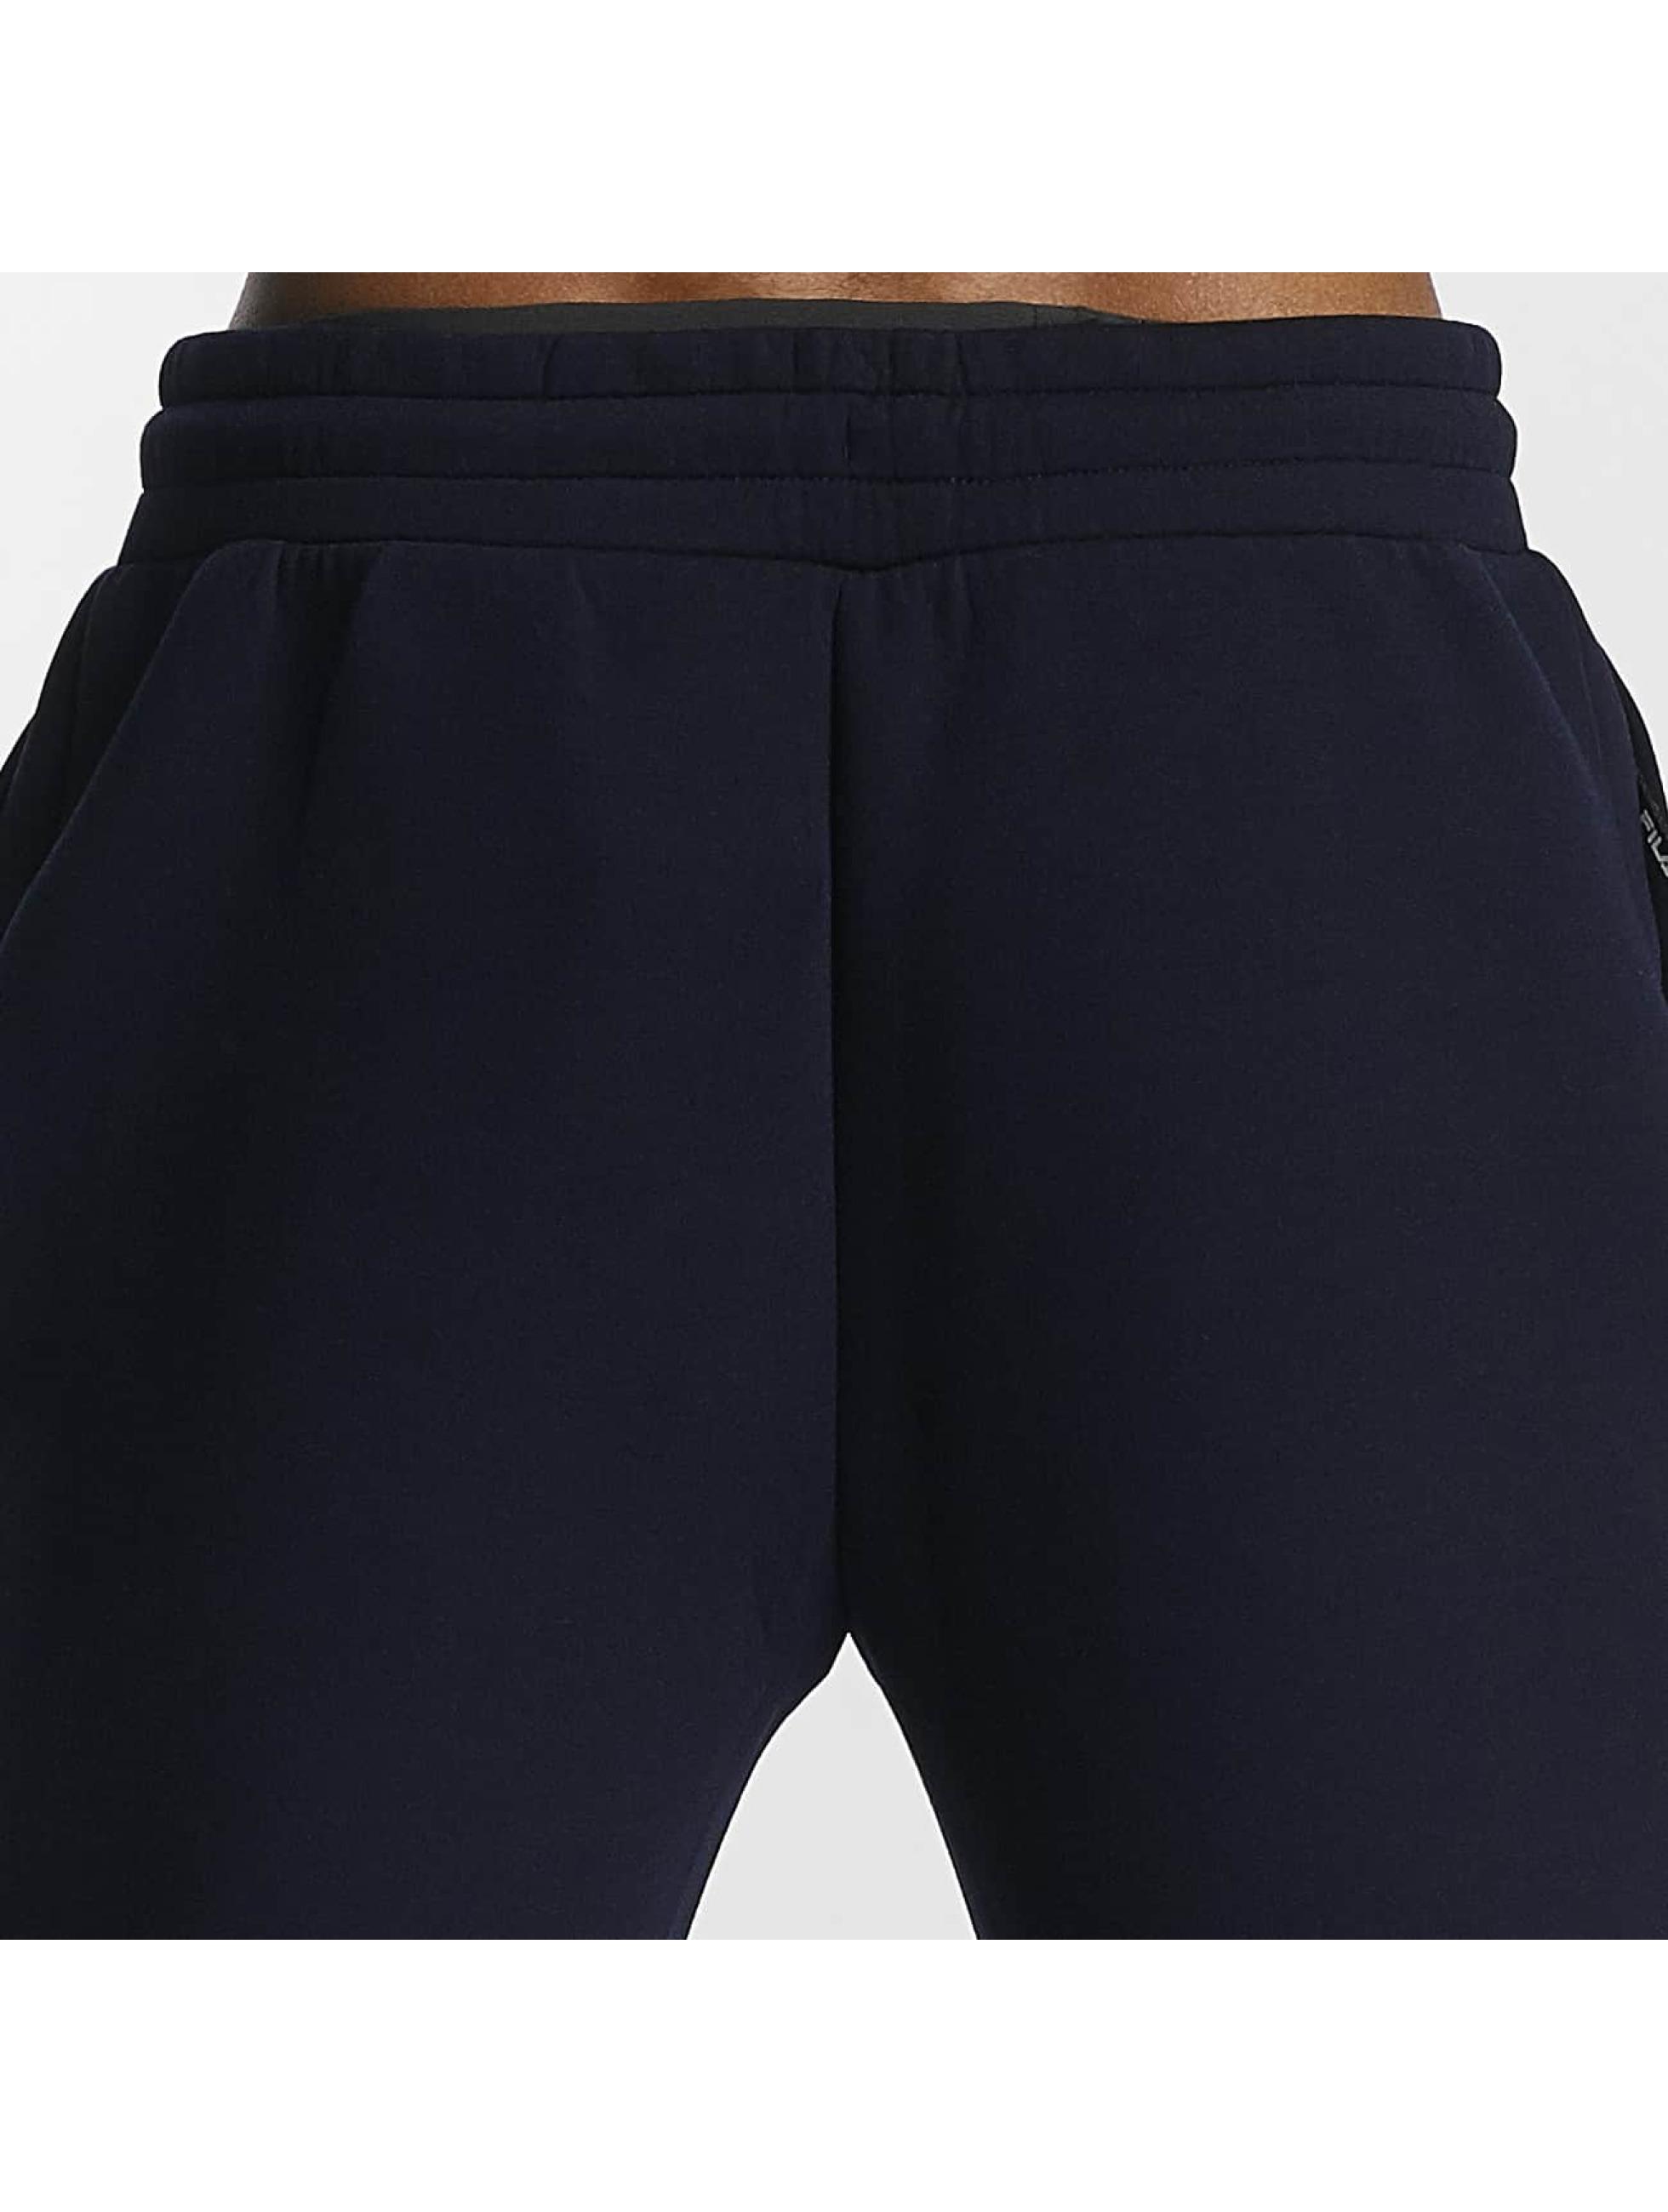 FILA joggingbroek Black Line Jude blauw